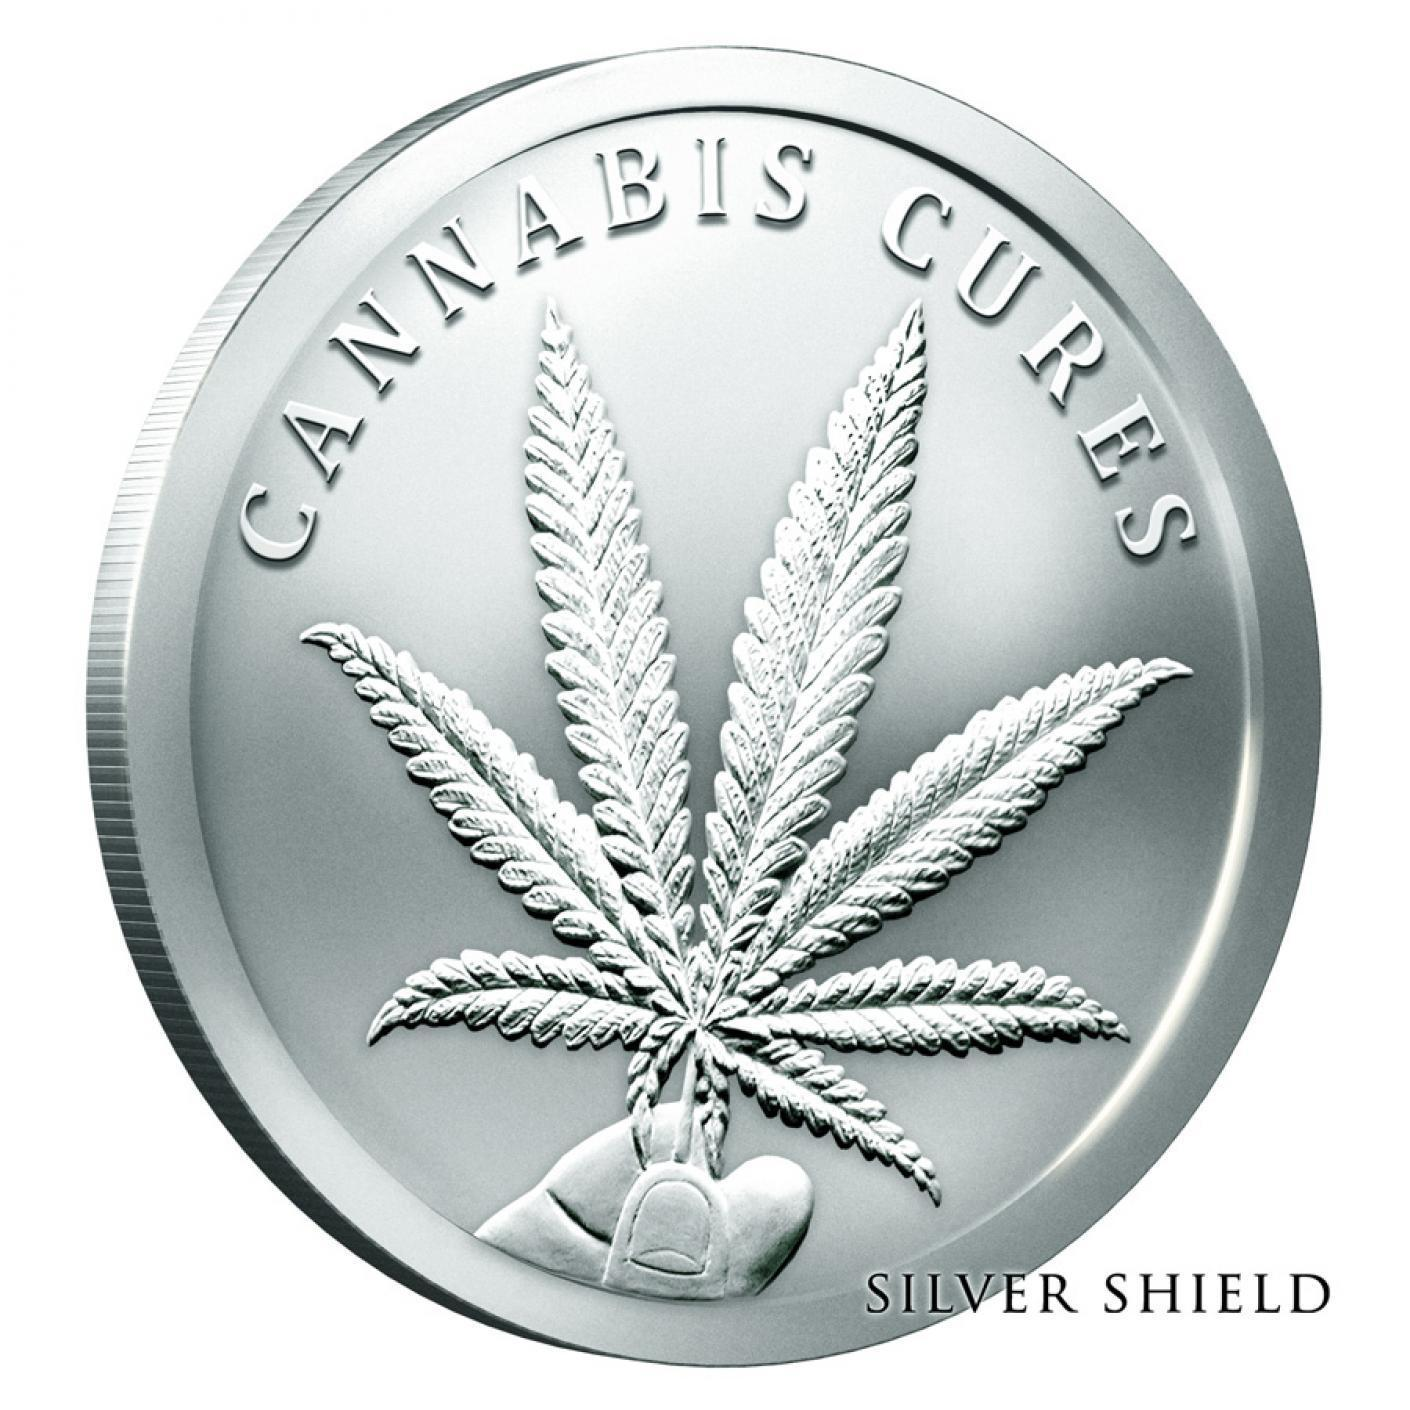 2019 Silver Shield 1 oz .999 Pure DONT TREAD ON ME BU Silver Round in Capsule